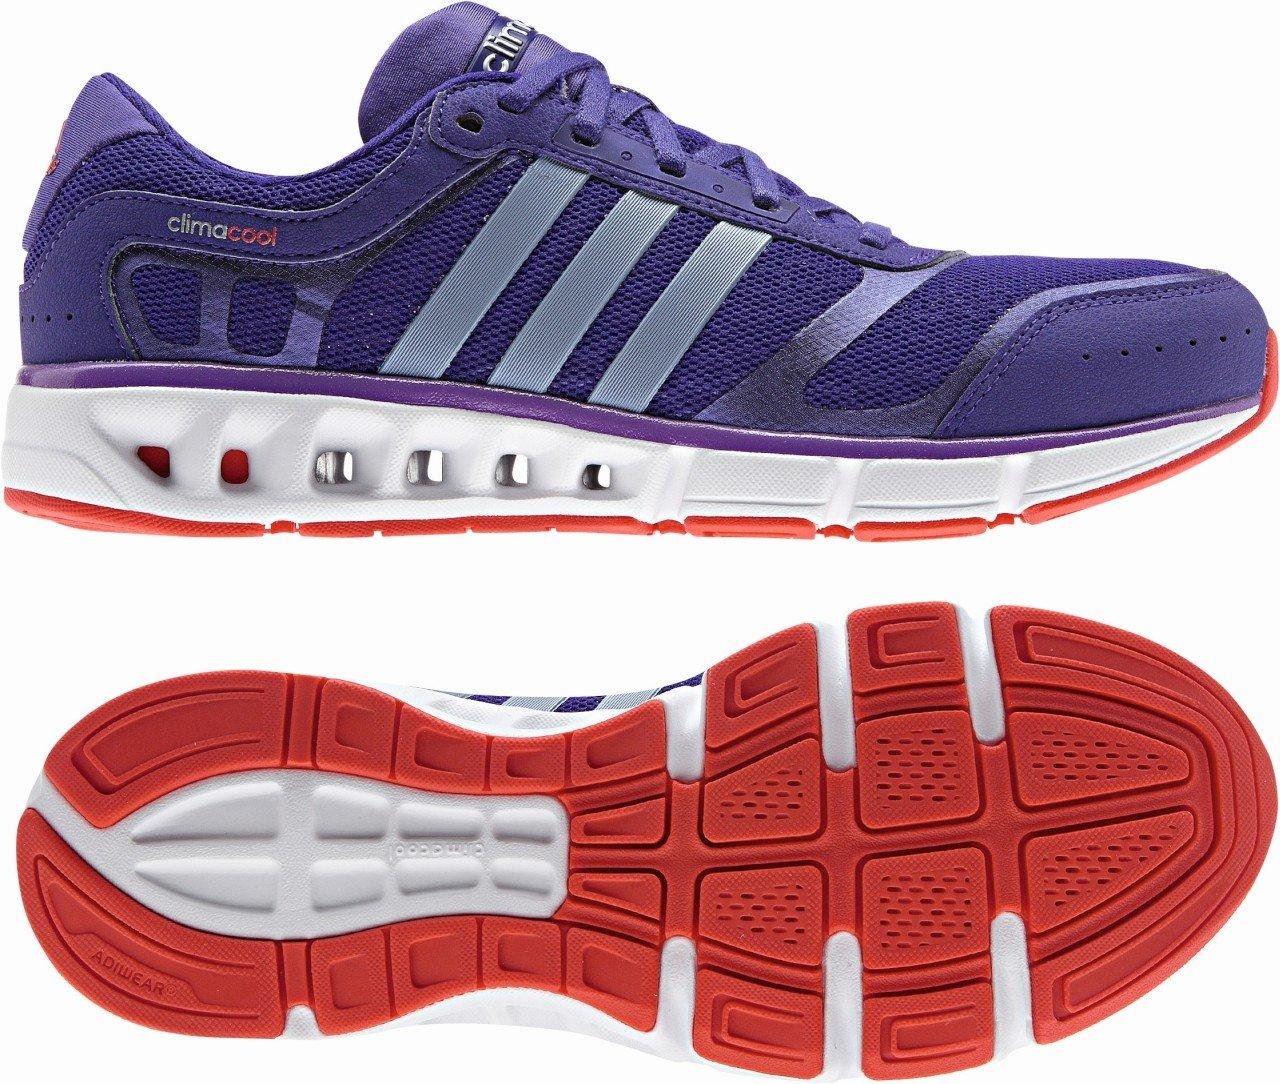 Adidas Climacool Ride Q33517 Damen Laufschuhe, Größe Adidas 10.5   Amazon.de  Sport   Freizeit eef34c4d23